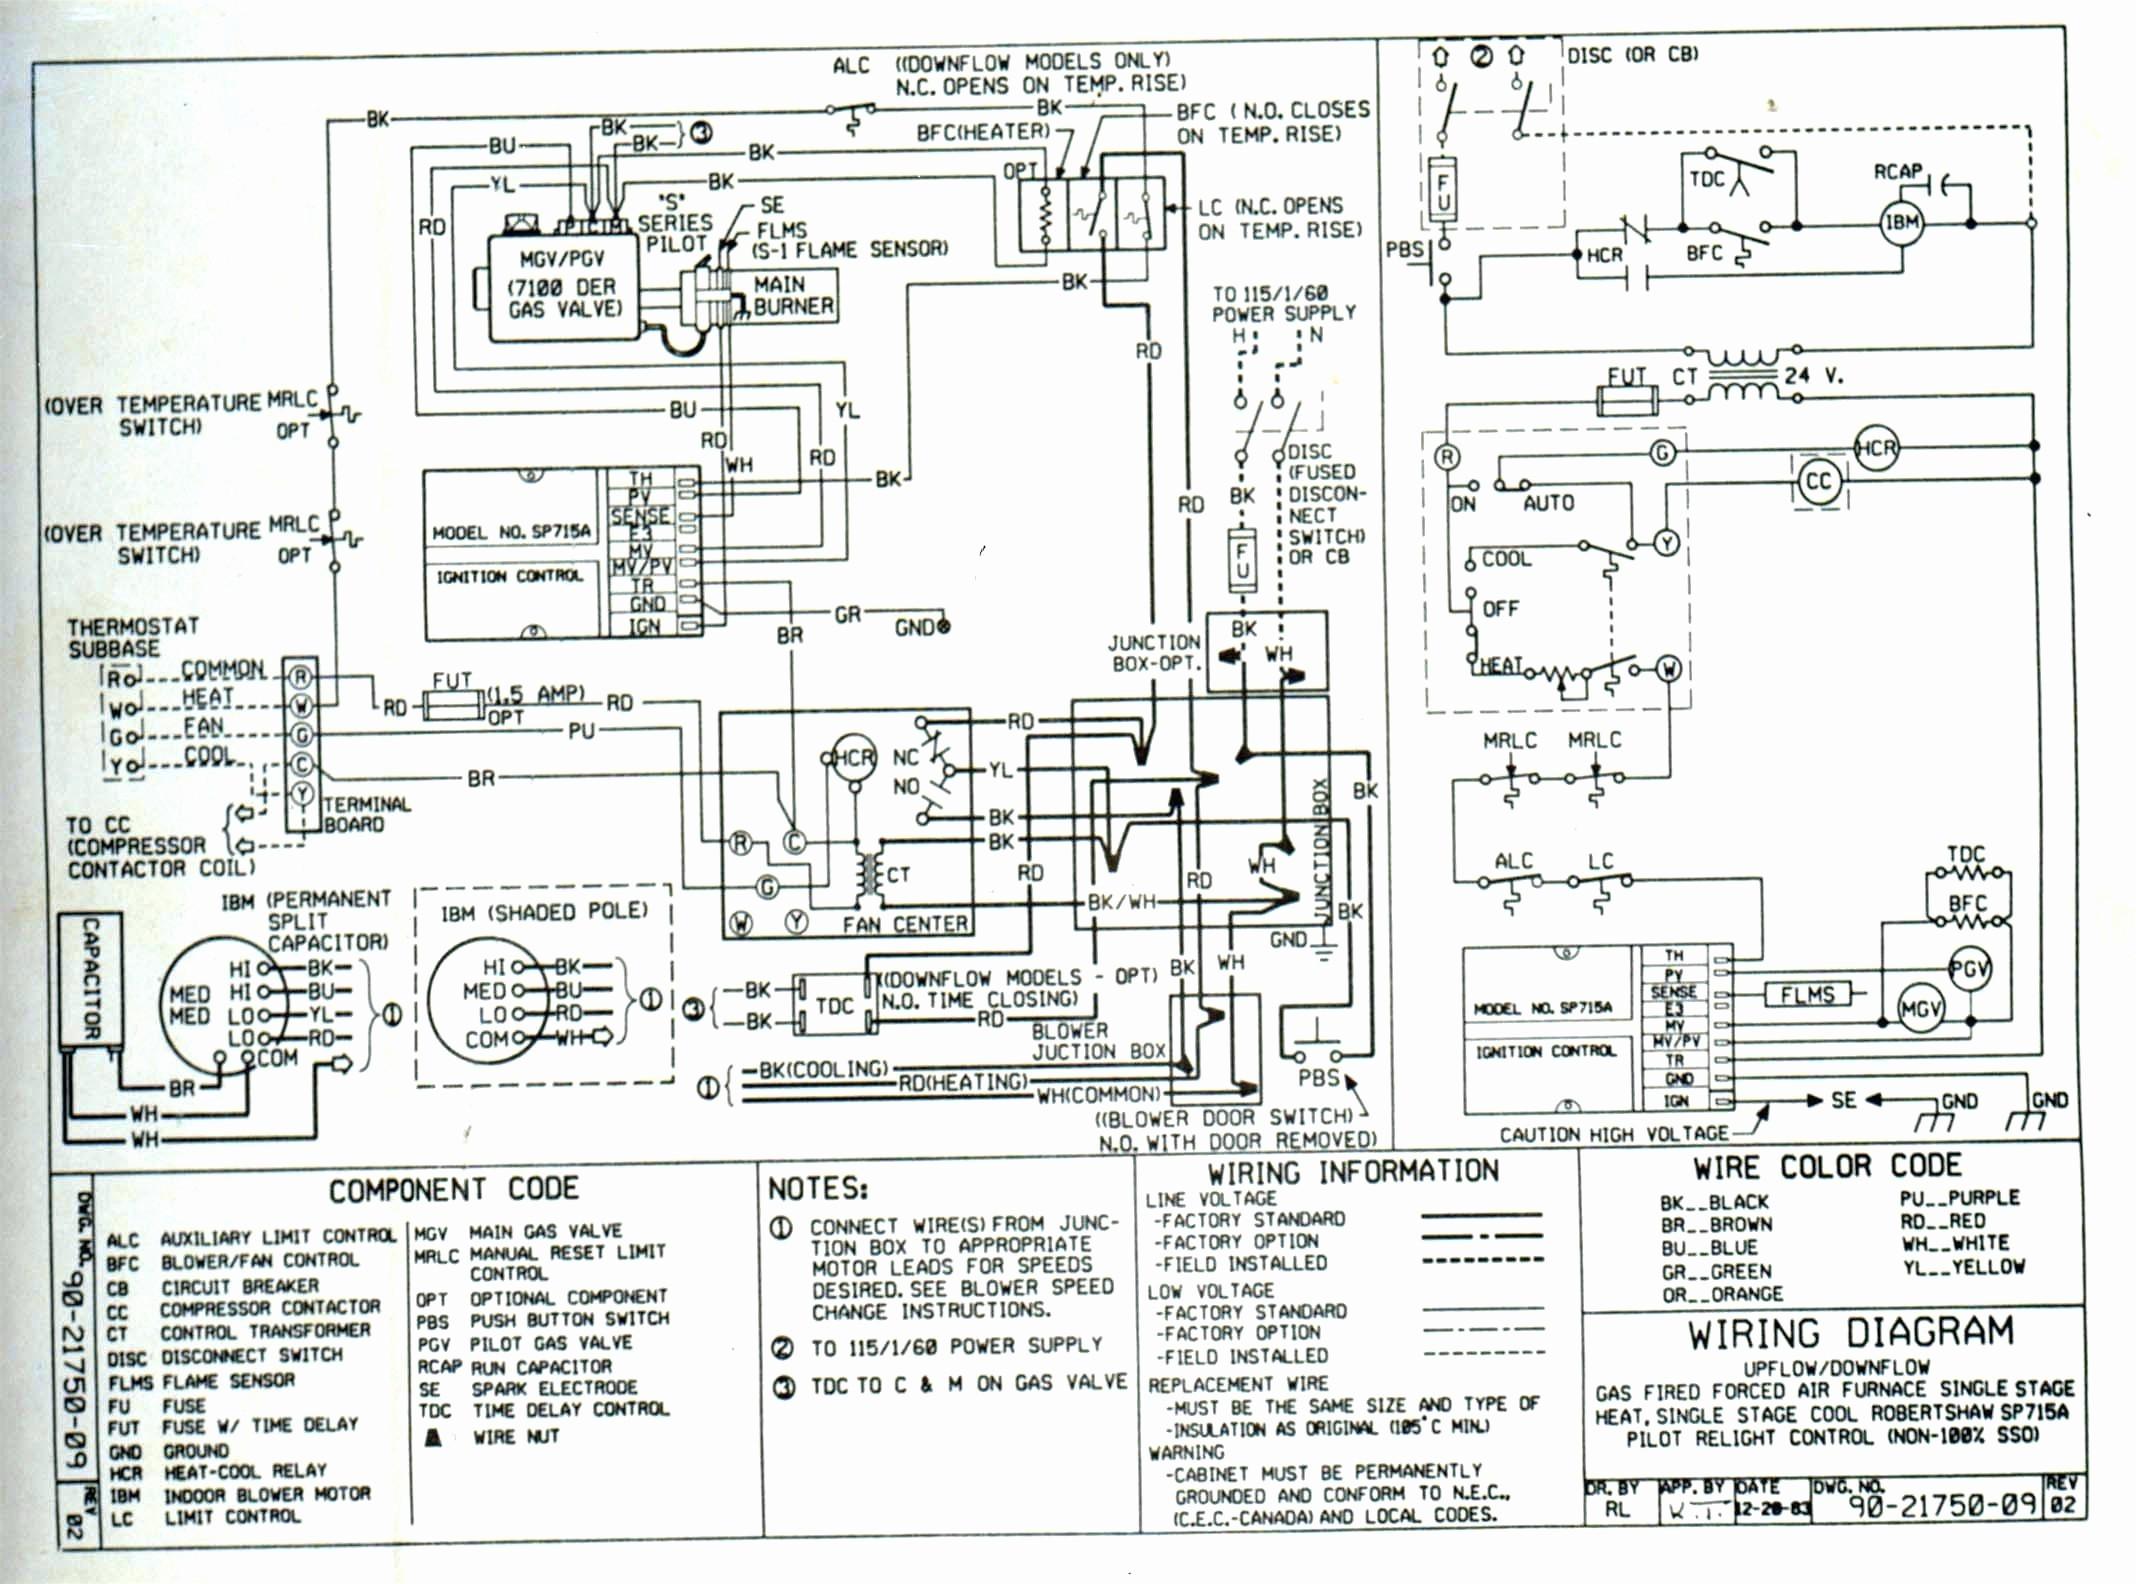 bodine b50st wiring diagram fuse box \u0026 wiring diagrambodine b50 wiring diagram 2 sg dbd de \\u2022bodine b50 wiring diagram wiring diagram rh